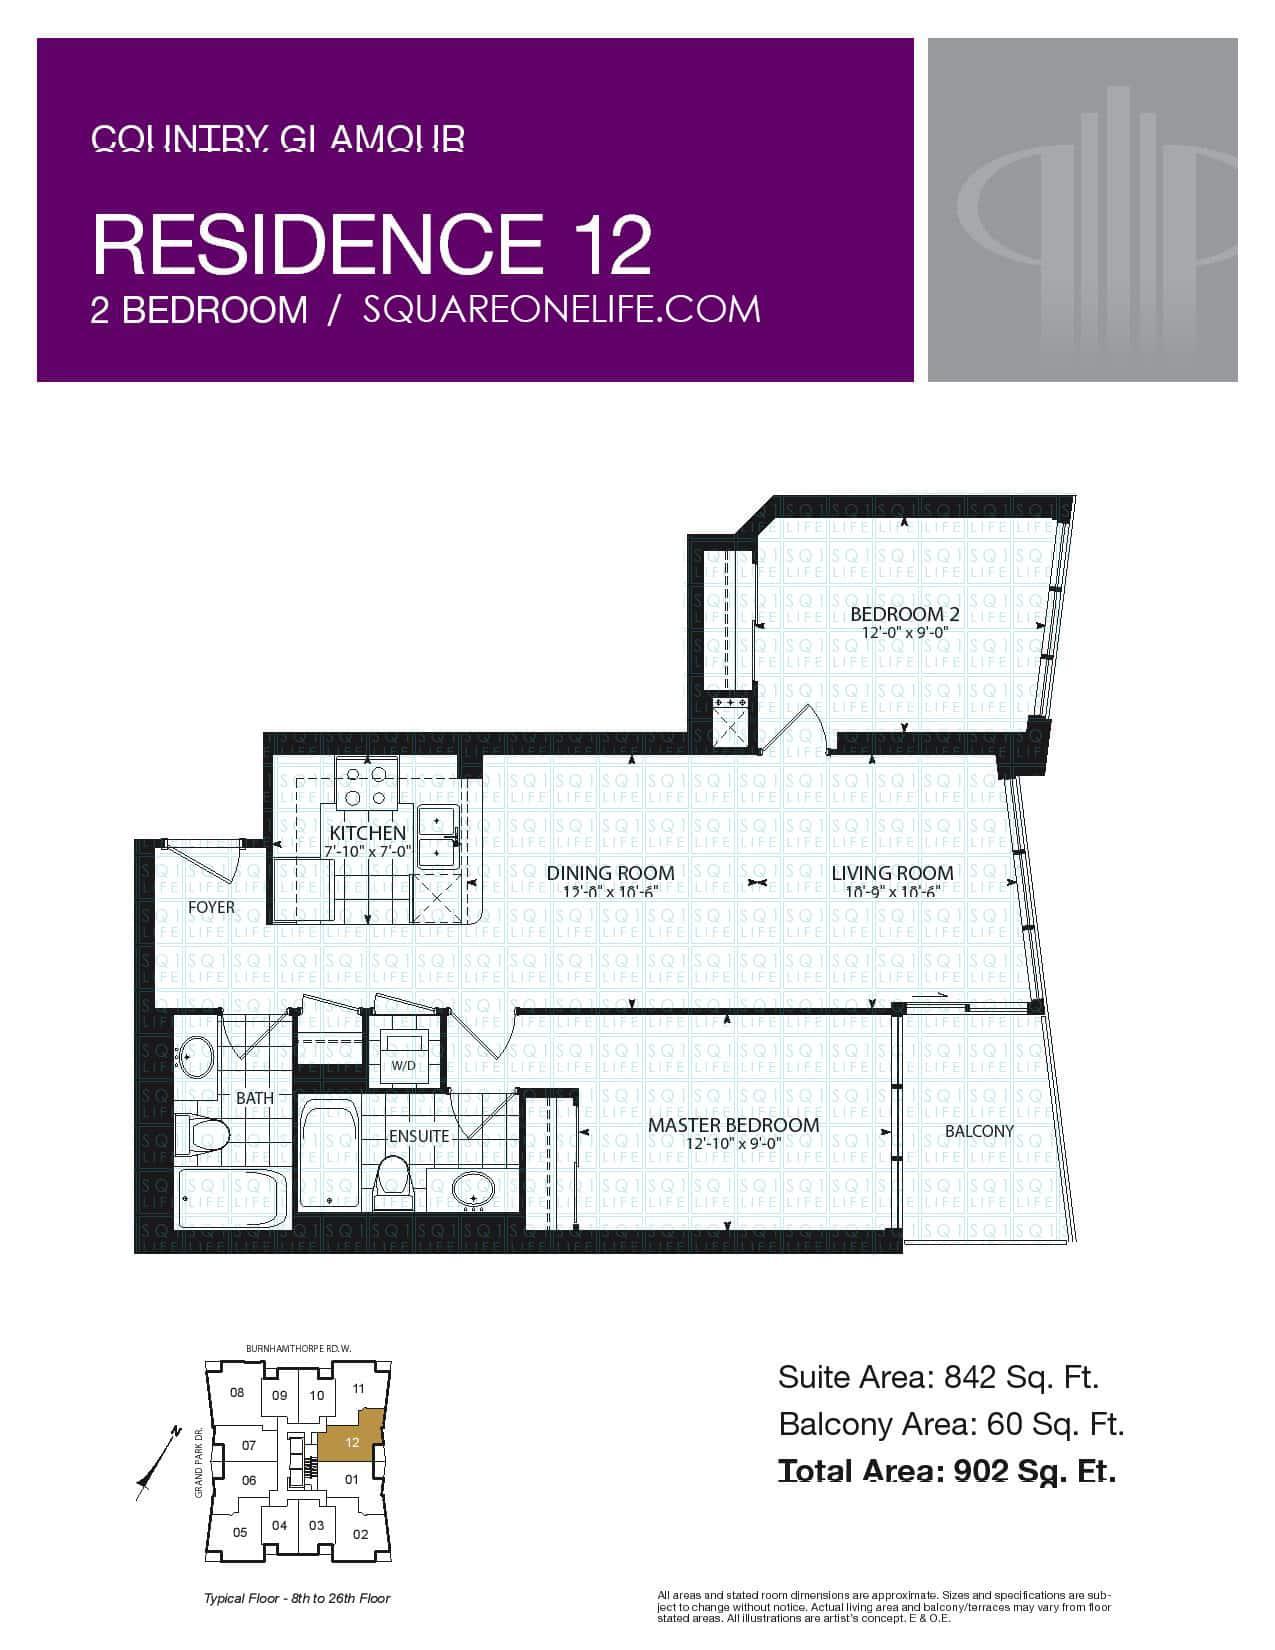 pinnacle grand park condo 3985 grand park dr squareonelife floorplan residence 12 2 bed 2 bath 842 sqft